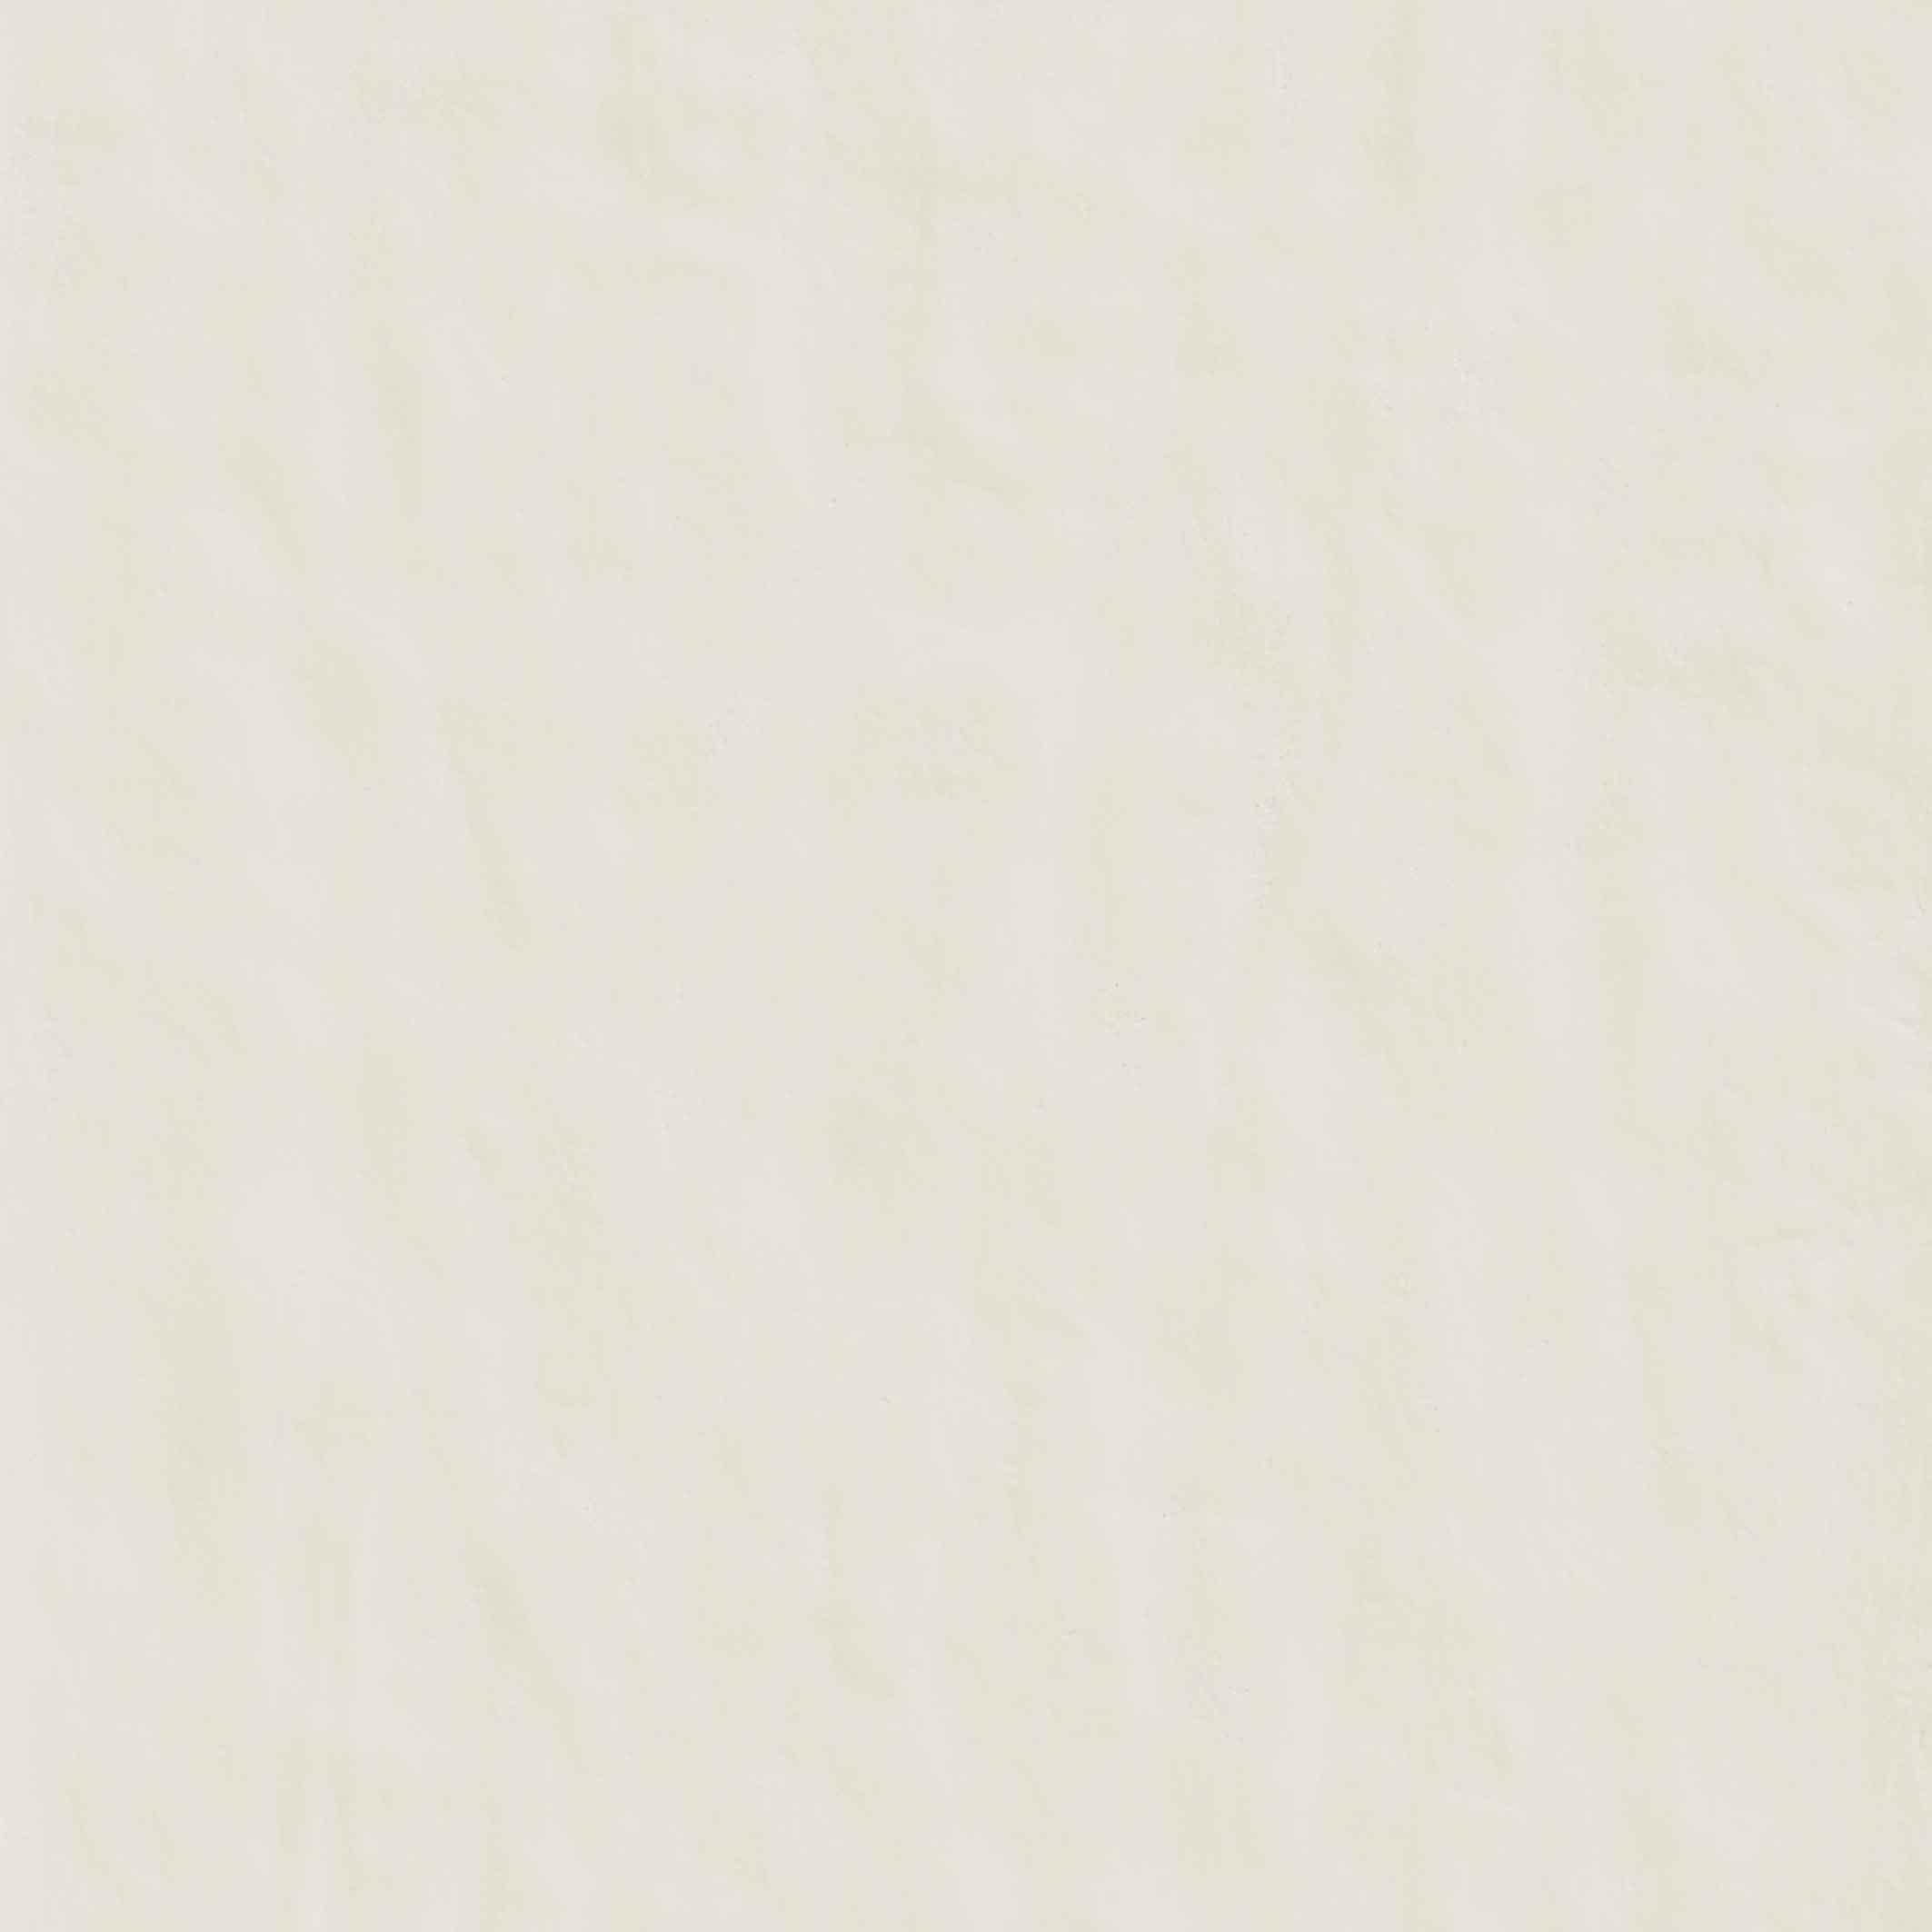 Neutra 6.0 Bianco 01 Matte 10mm 80 x 80